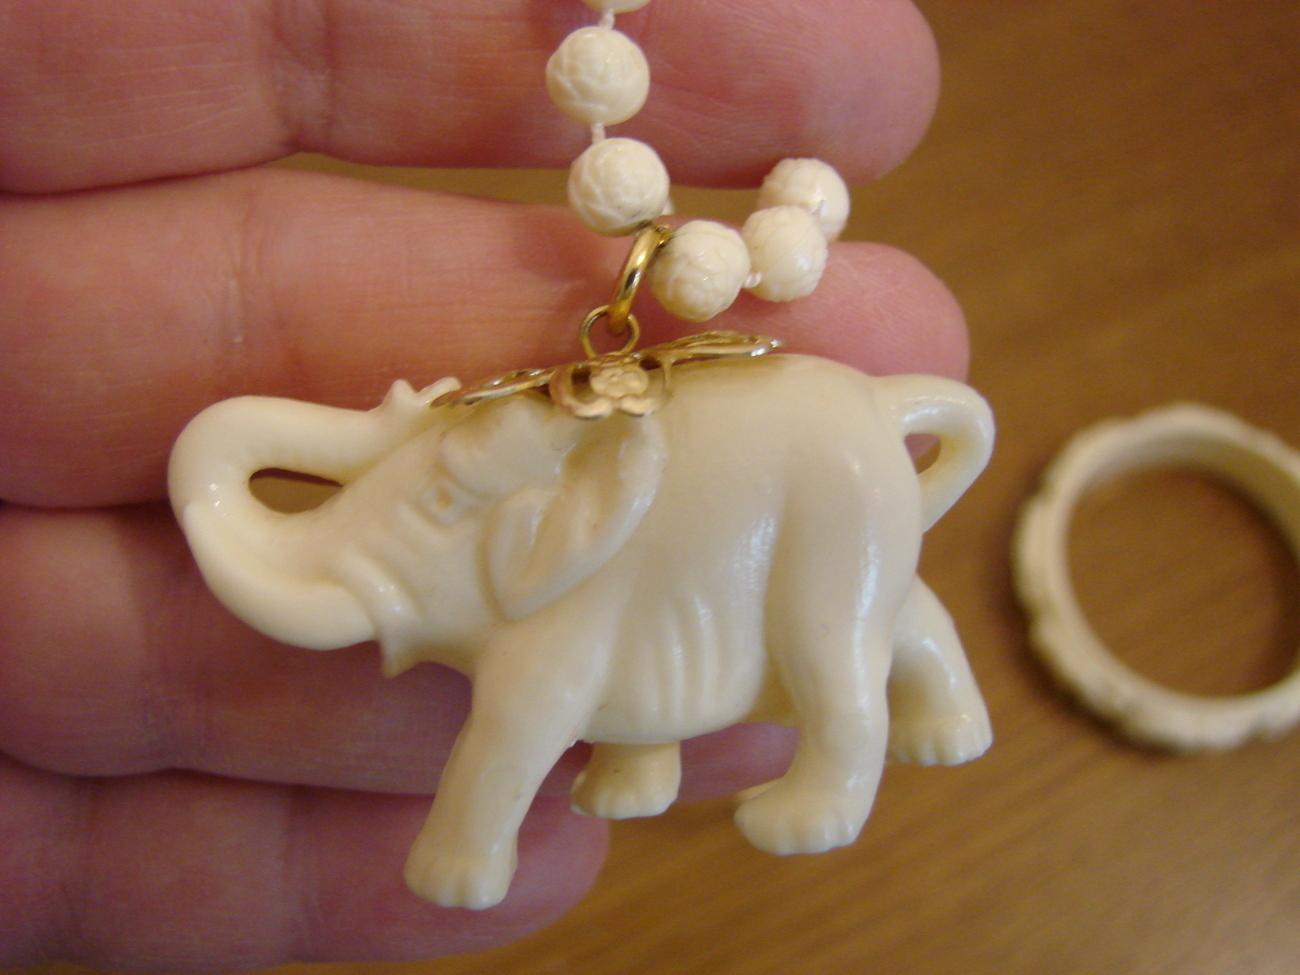 ELEPHANT BANGLE cute elephant pretty elephant bangle gift idea collectable celluloid elephant bangle celluloid bangle